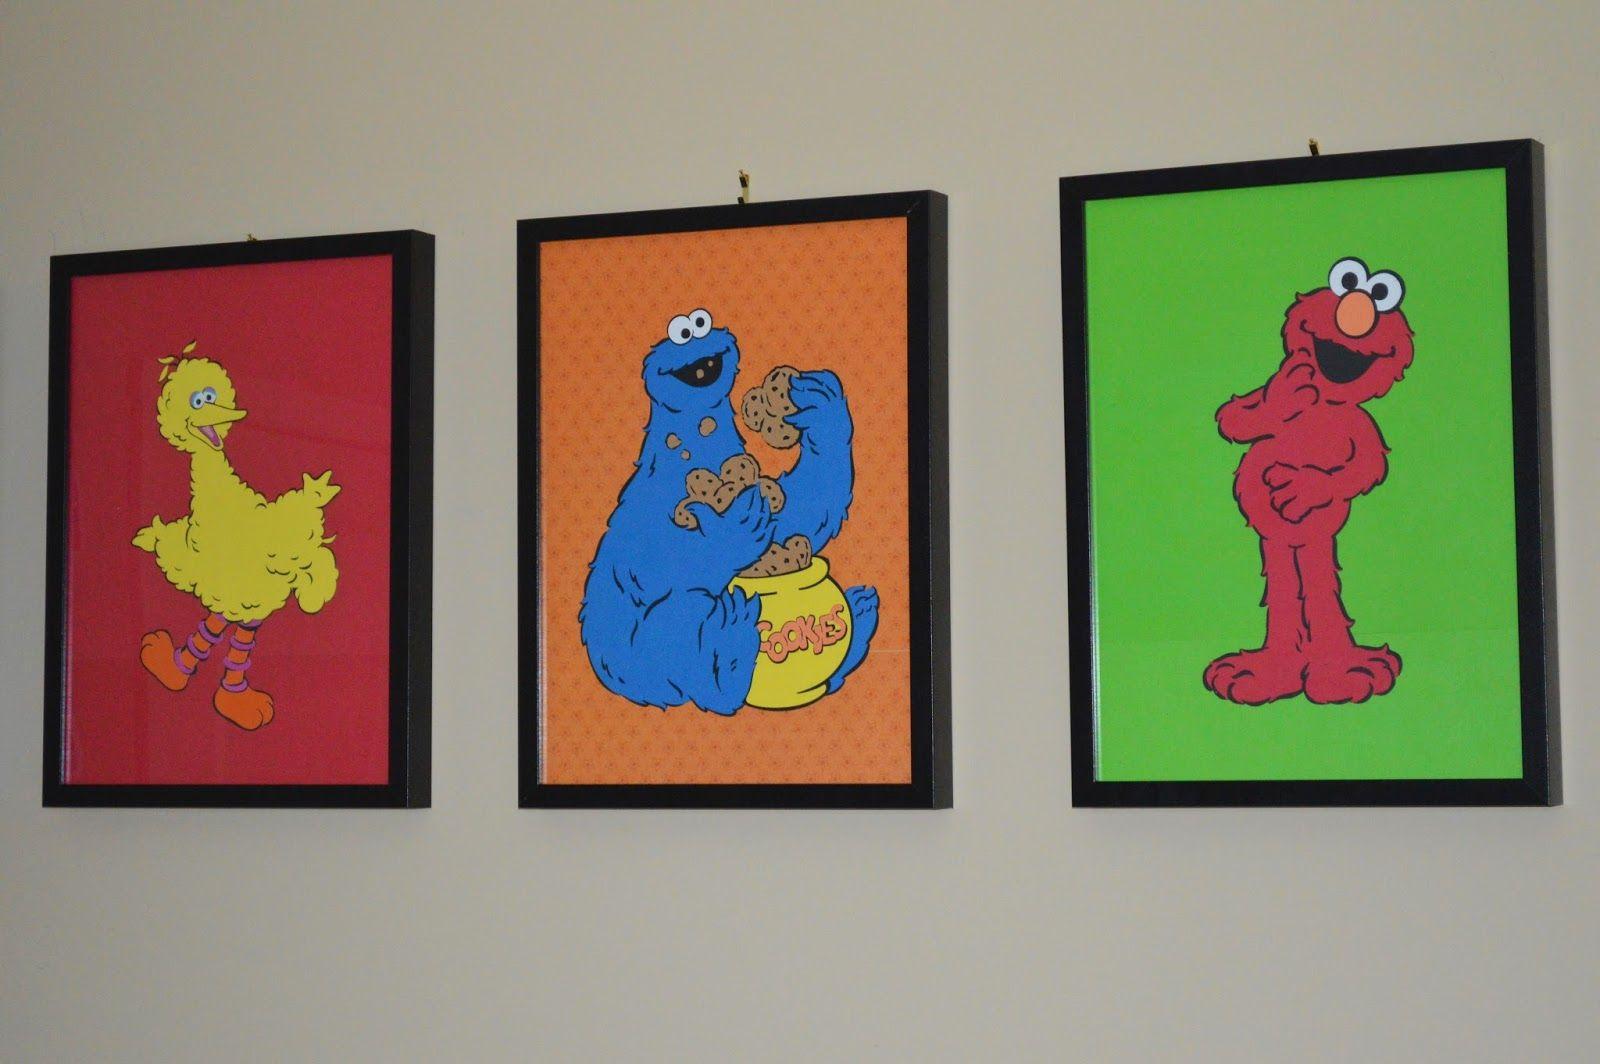 Elmo's World in 2020 Elmo world, Kid room decor, Elmo